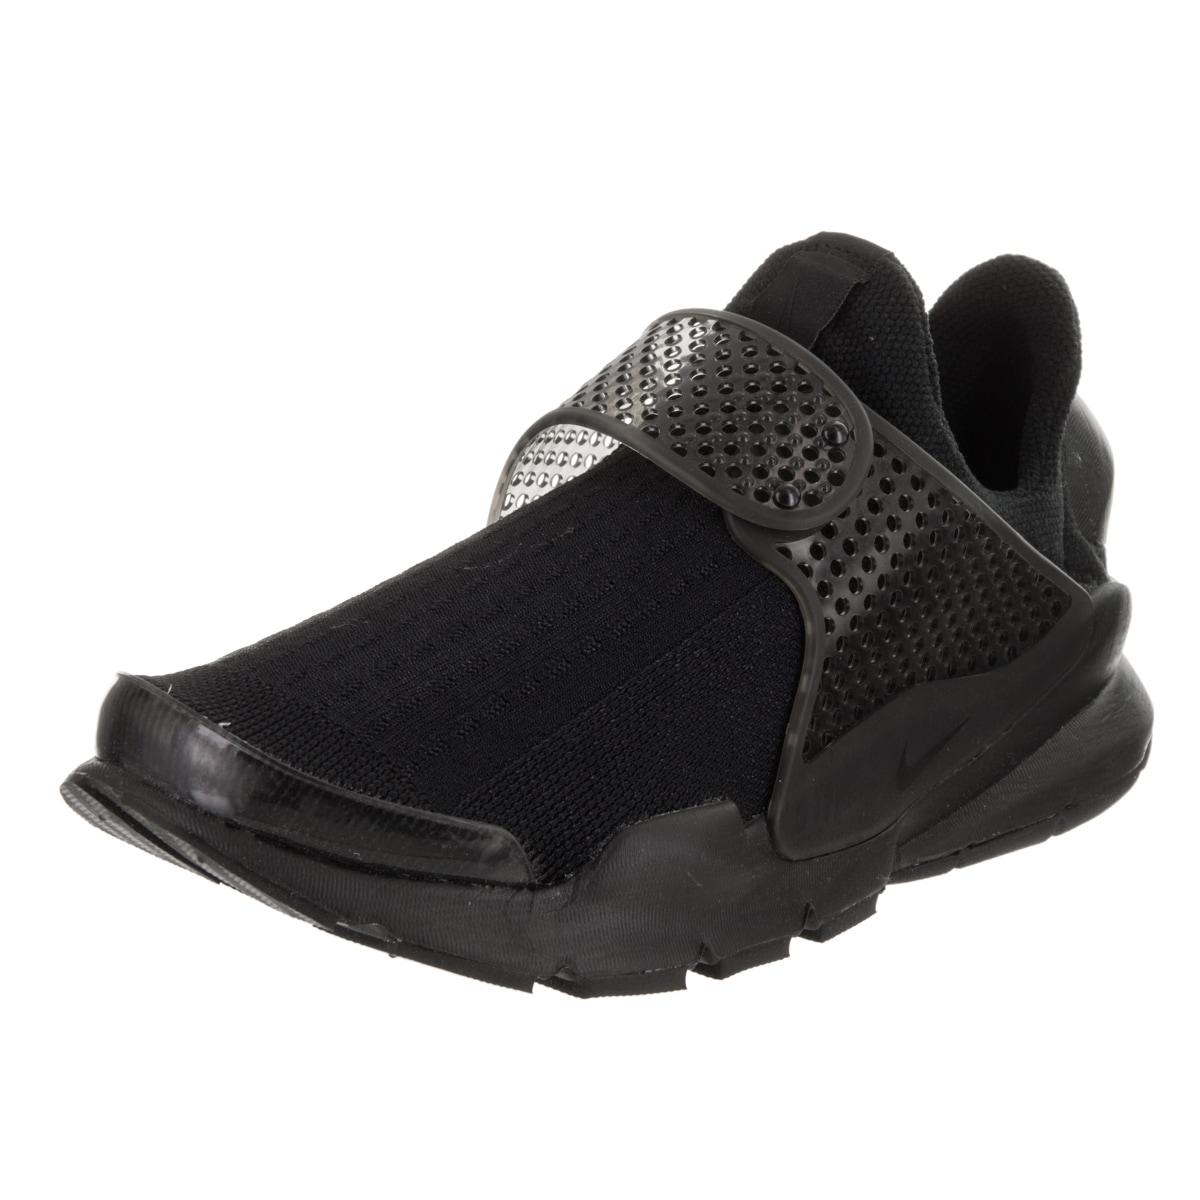 Nike Women's Sock Dart Black Synthetic Leather Running Sh...